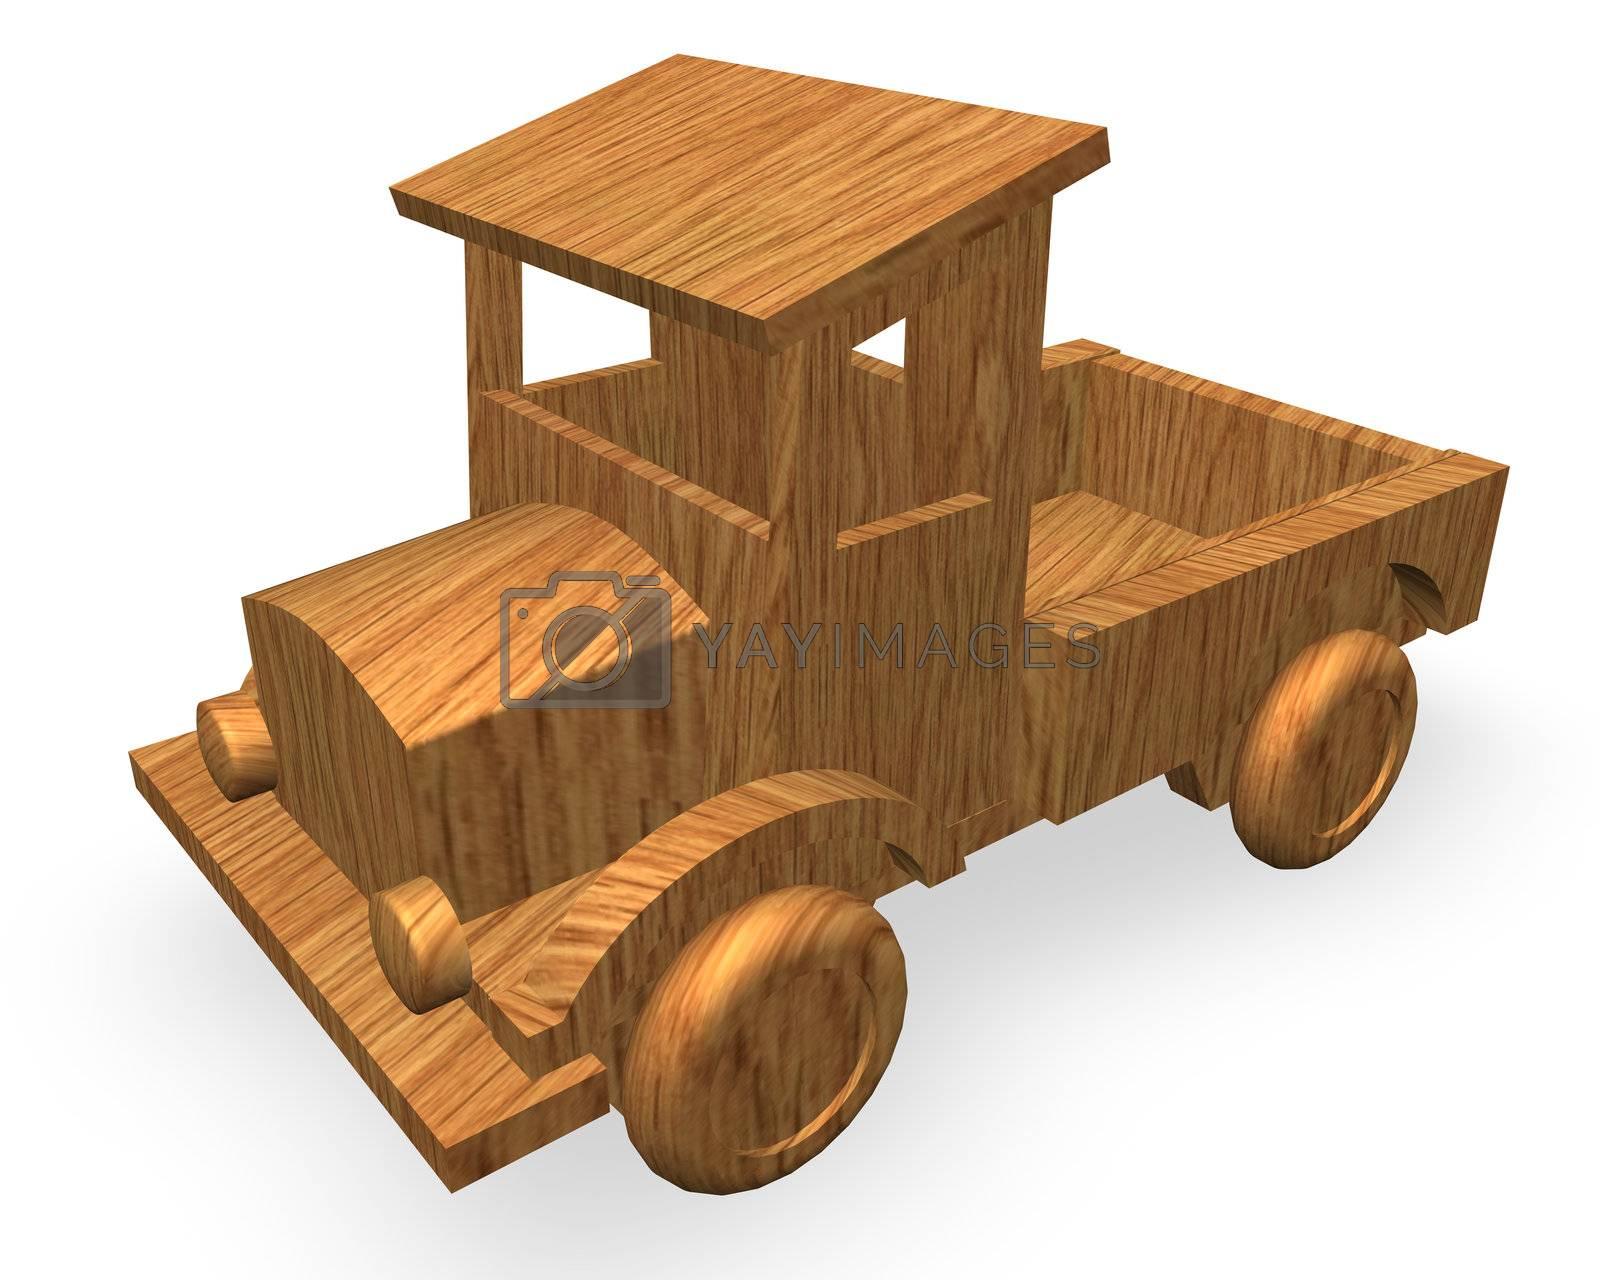 wood car toy on white background